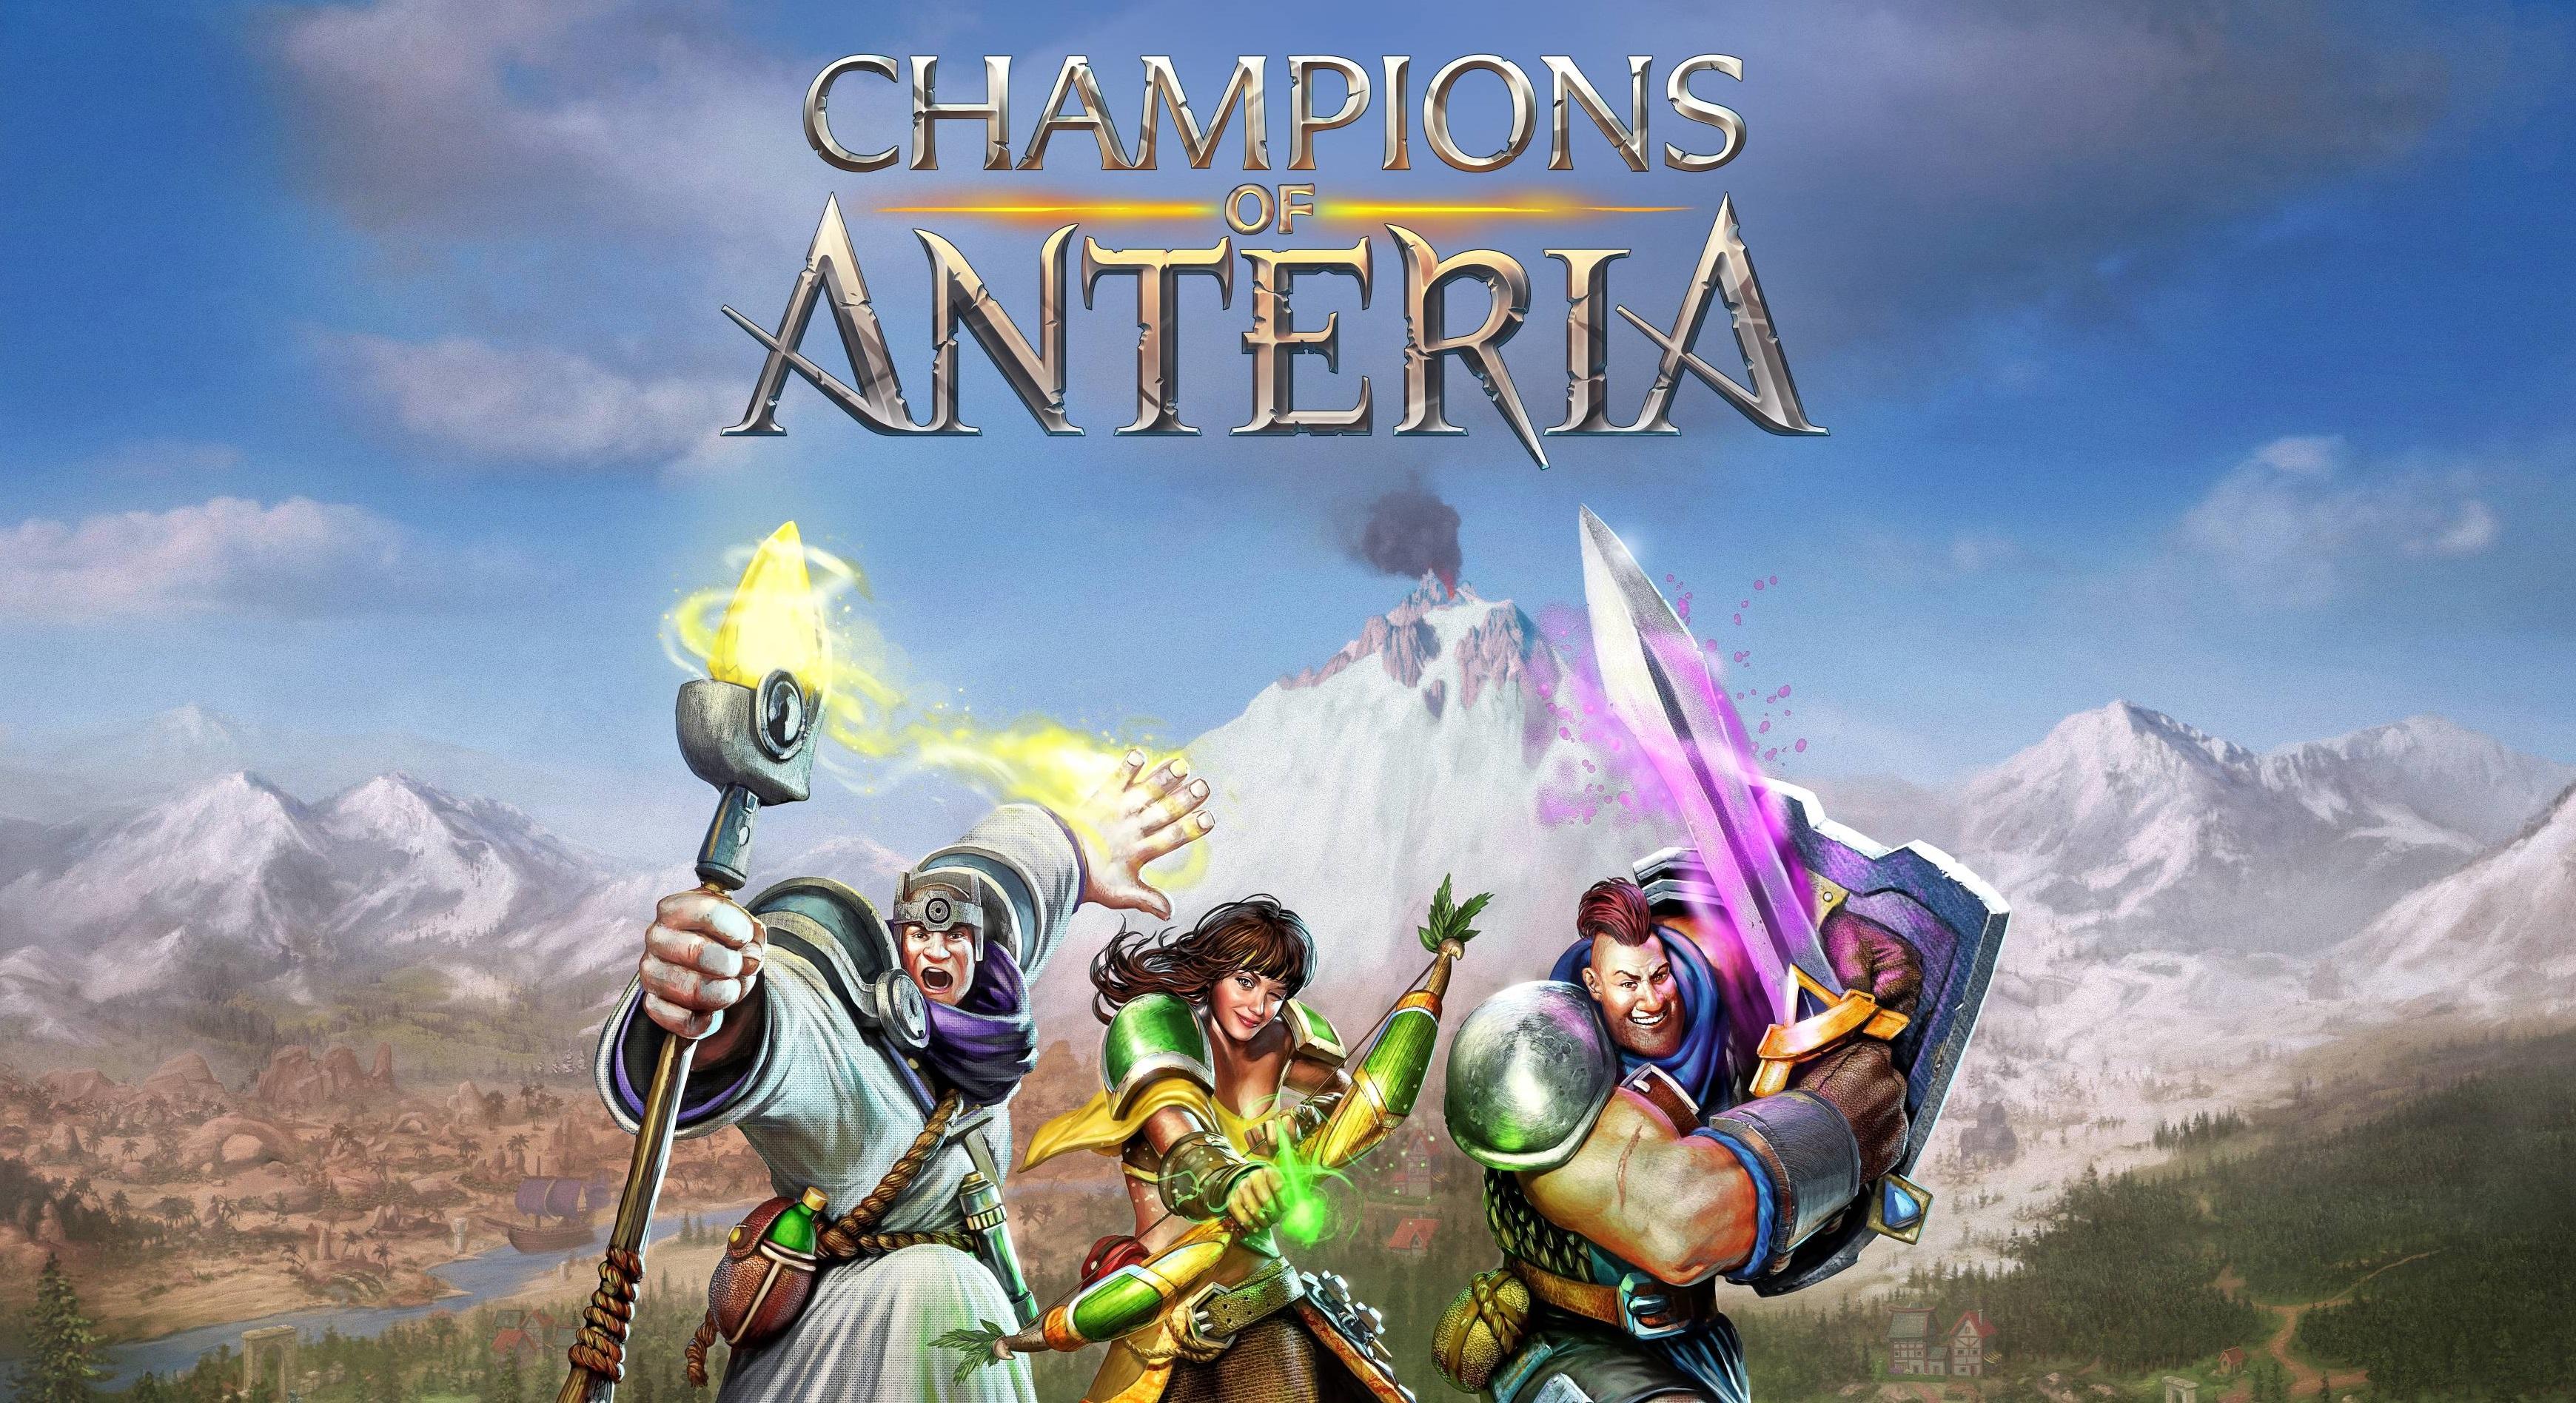 Ubisoft presenta su nuevo juego: Champions of Anteria